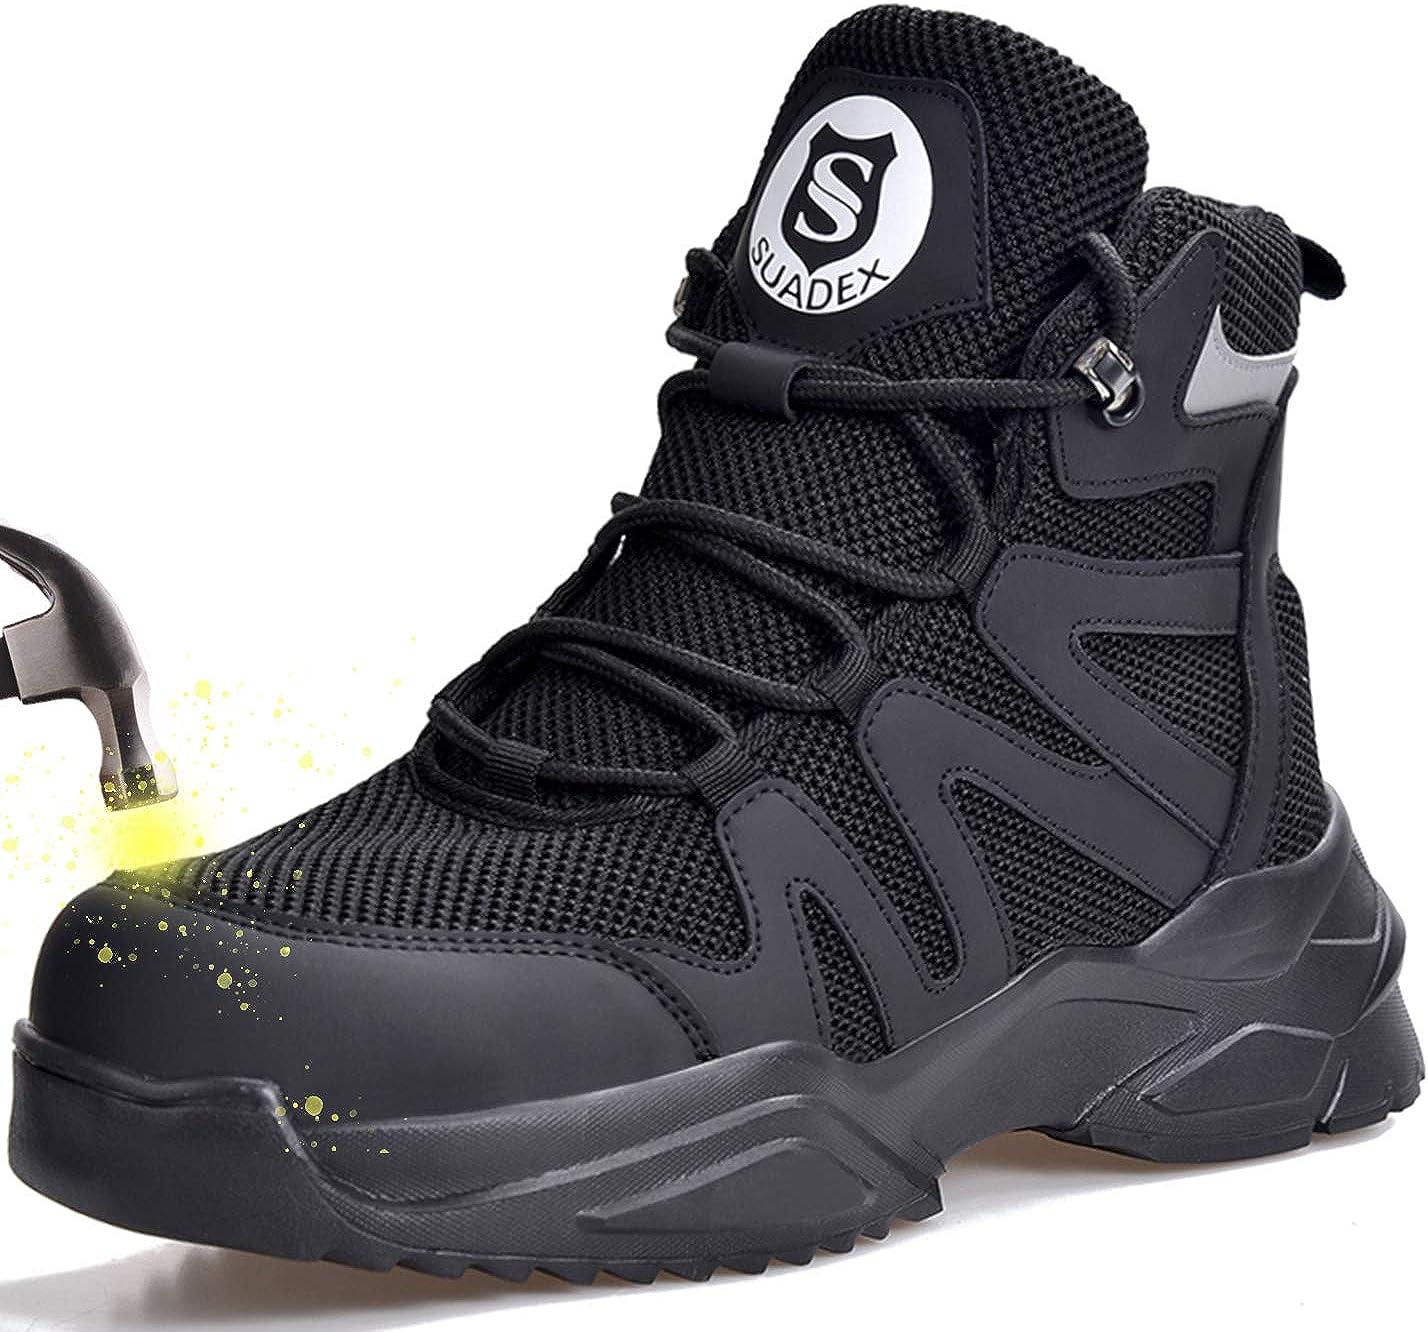 Ranking TOP7 SUADEX Steel Max 55% OFF Toe Boots for Indestructible Men Women S Work